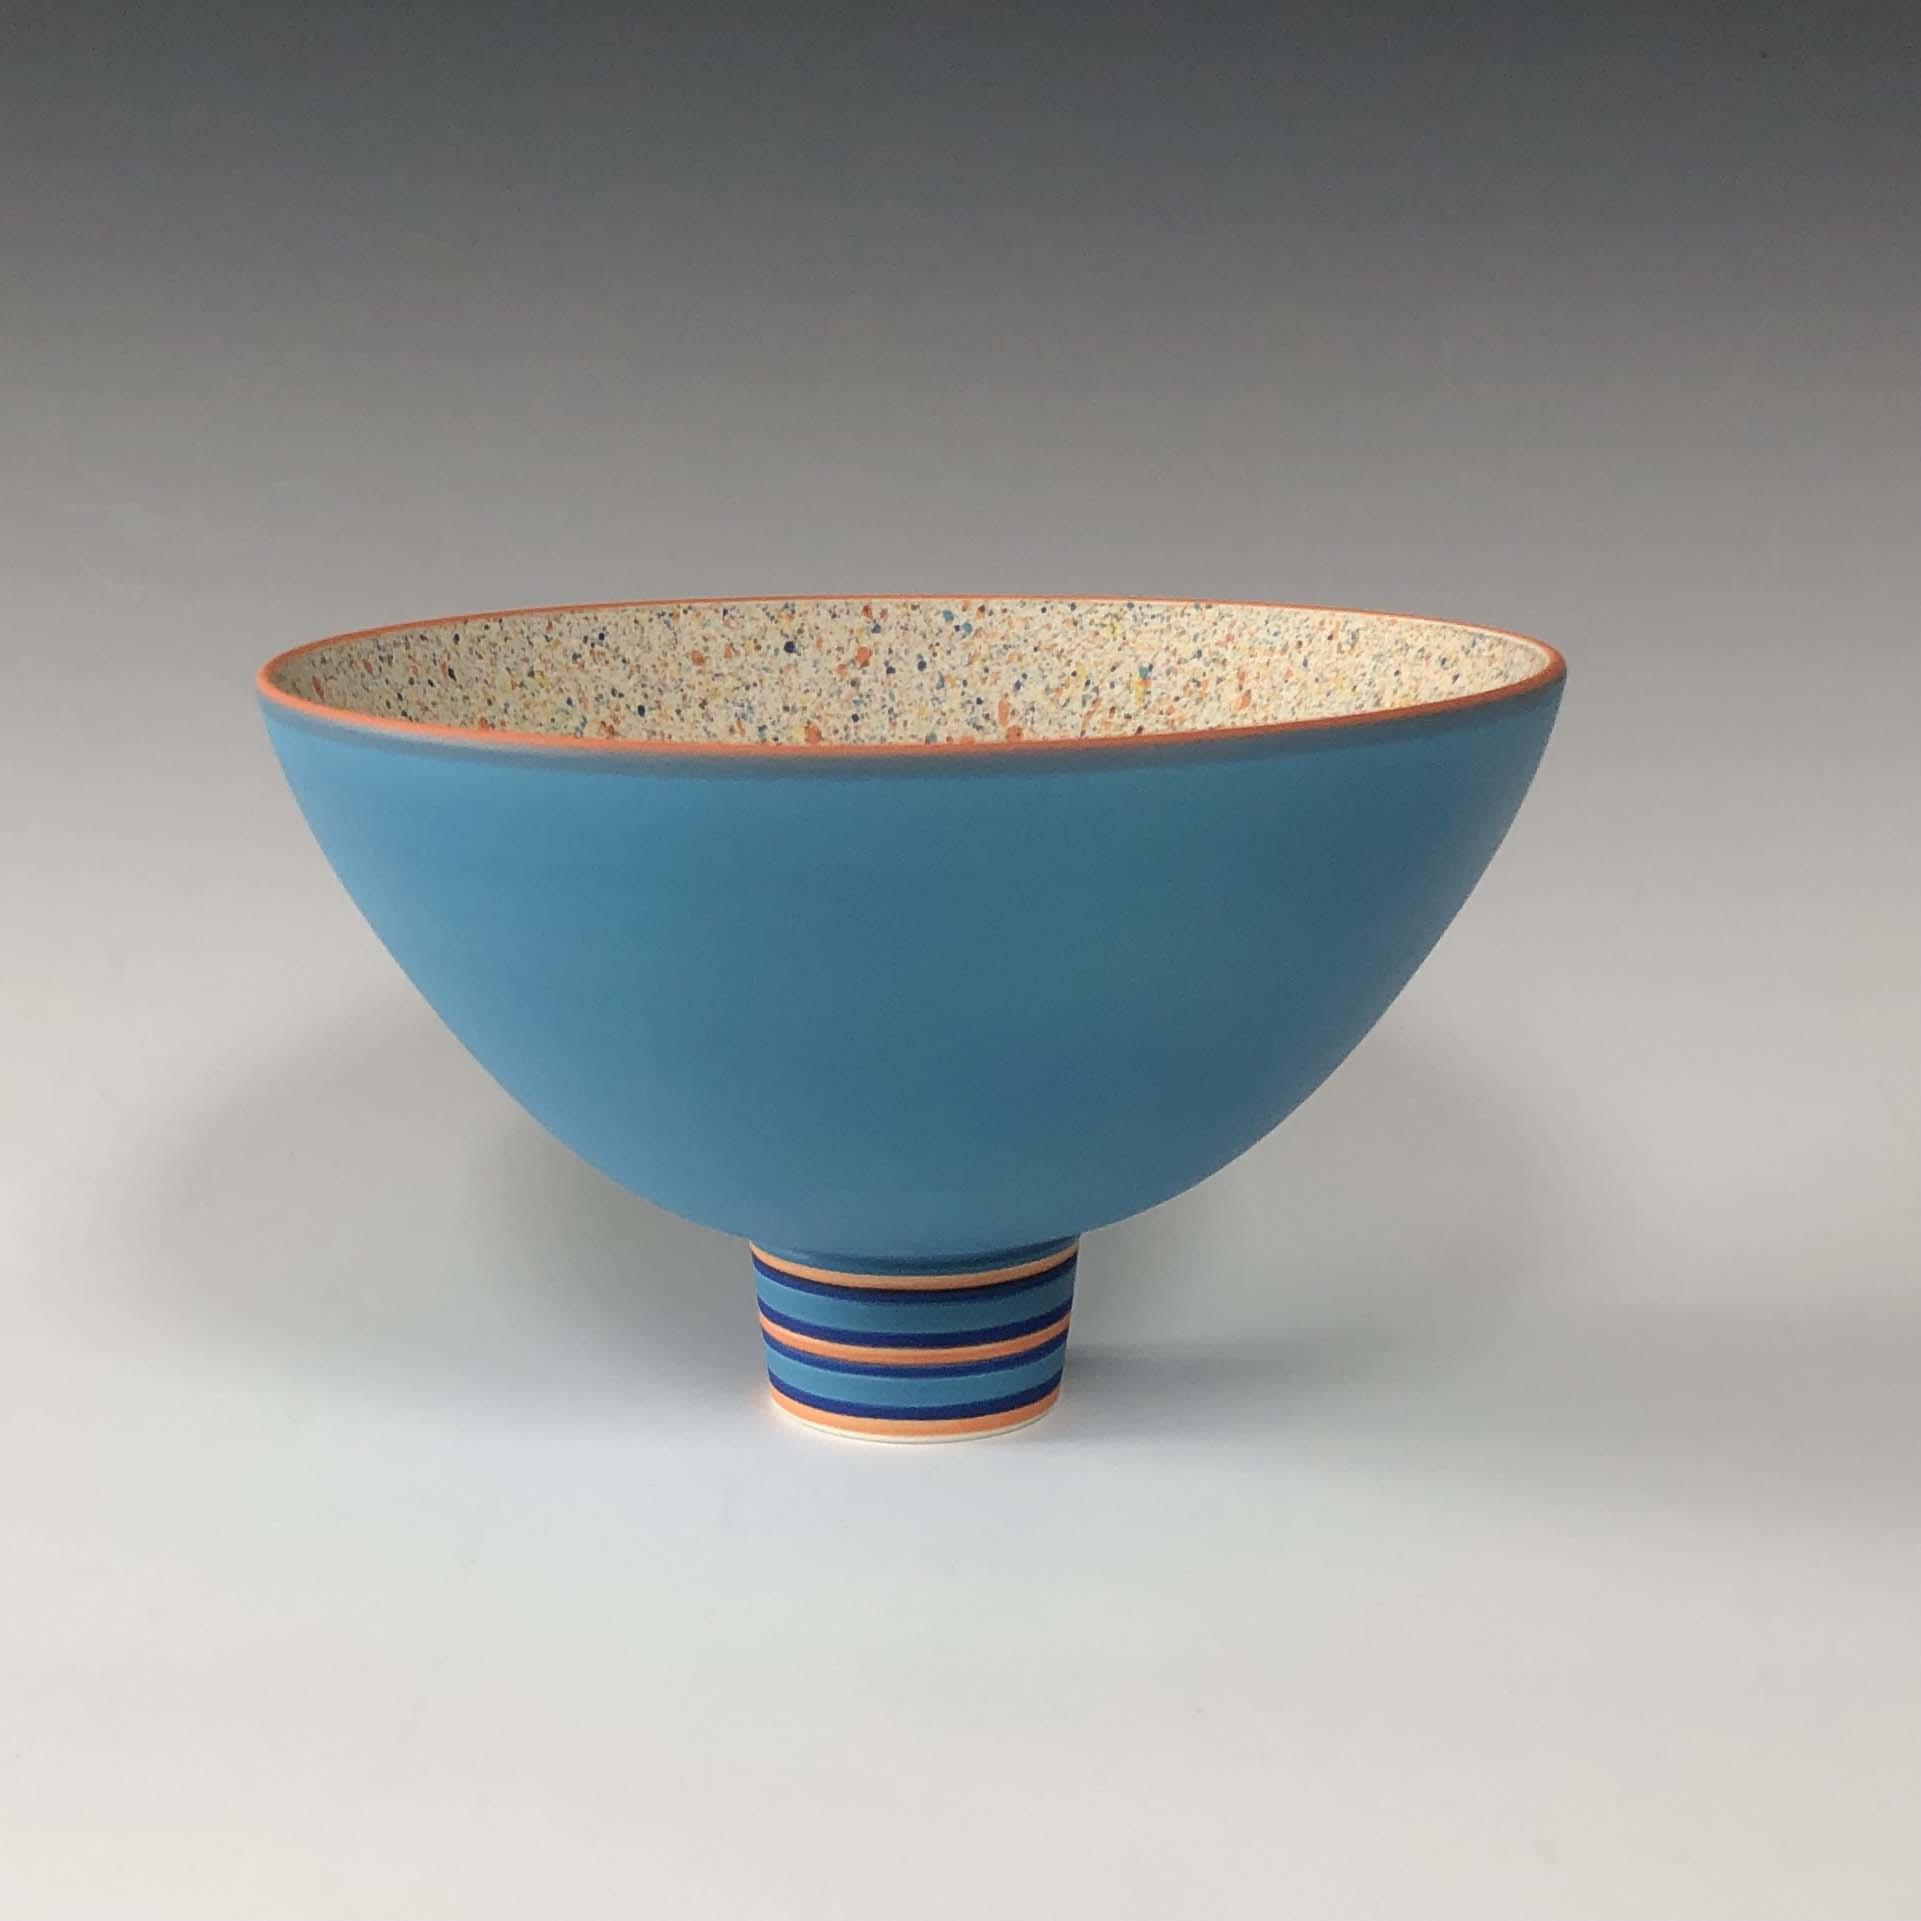 Pot 9. Turquoise:Orange flecked bowl on striped foot